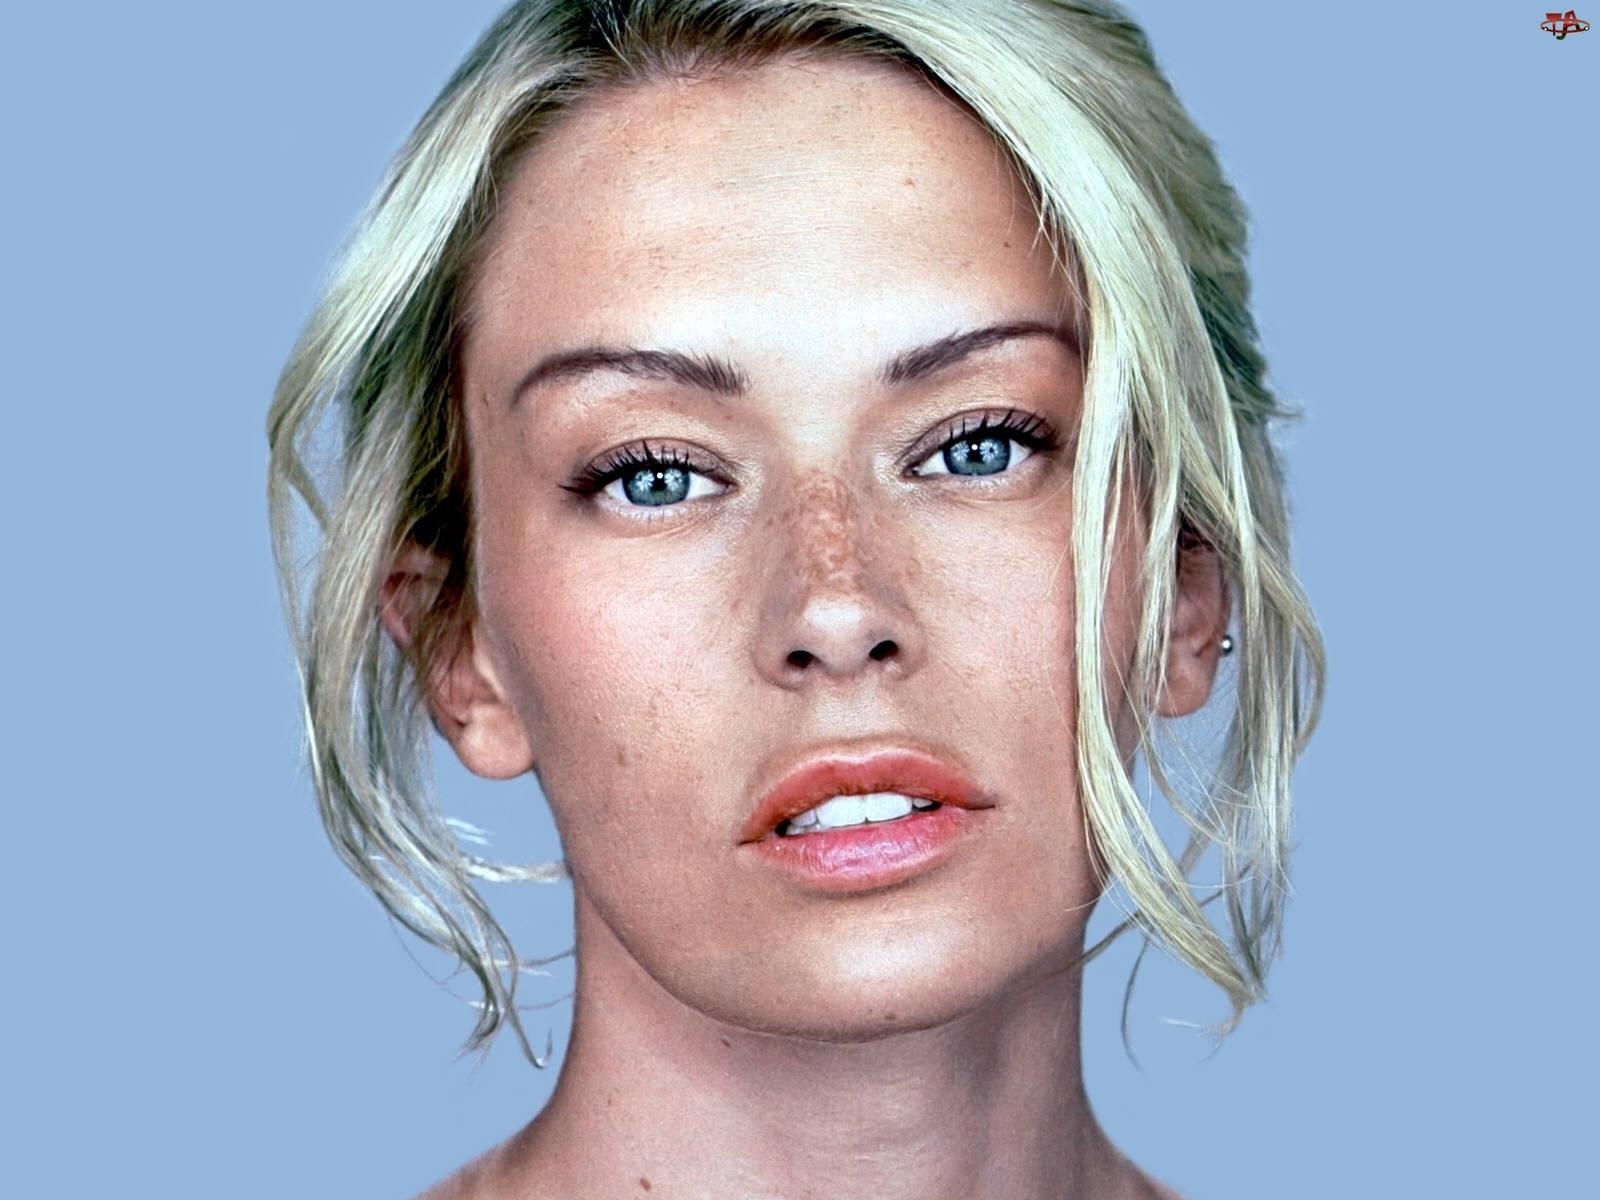 Jenna Jameson, twarz, Kobieta, nos